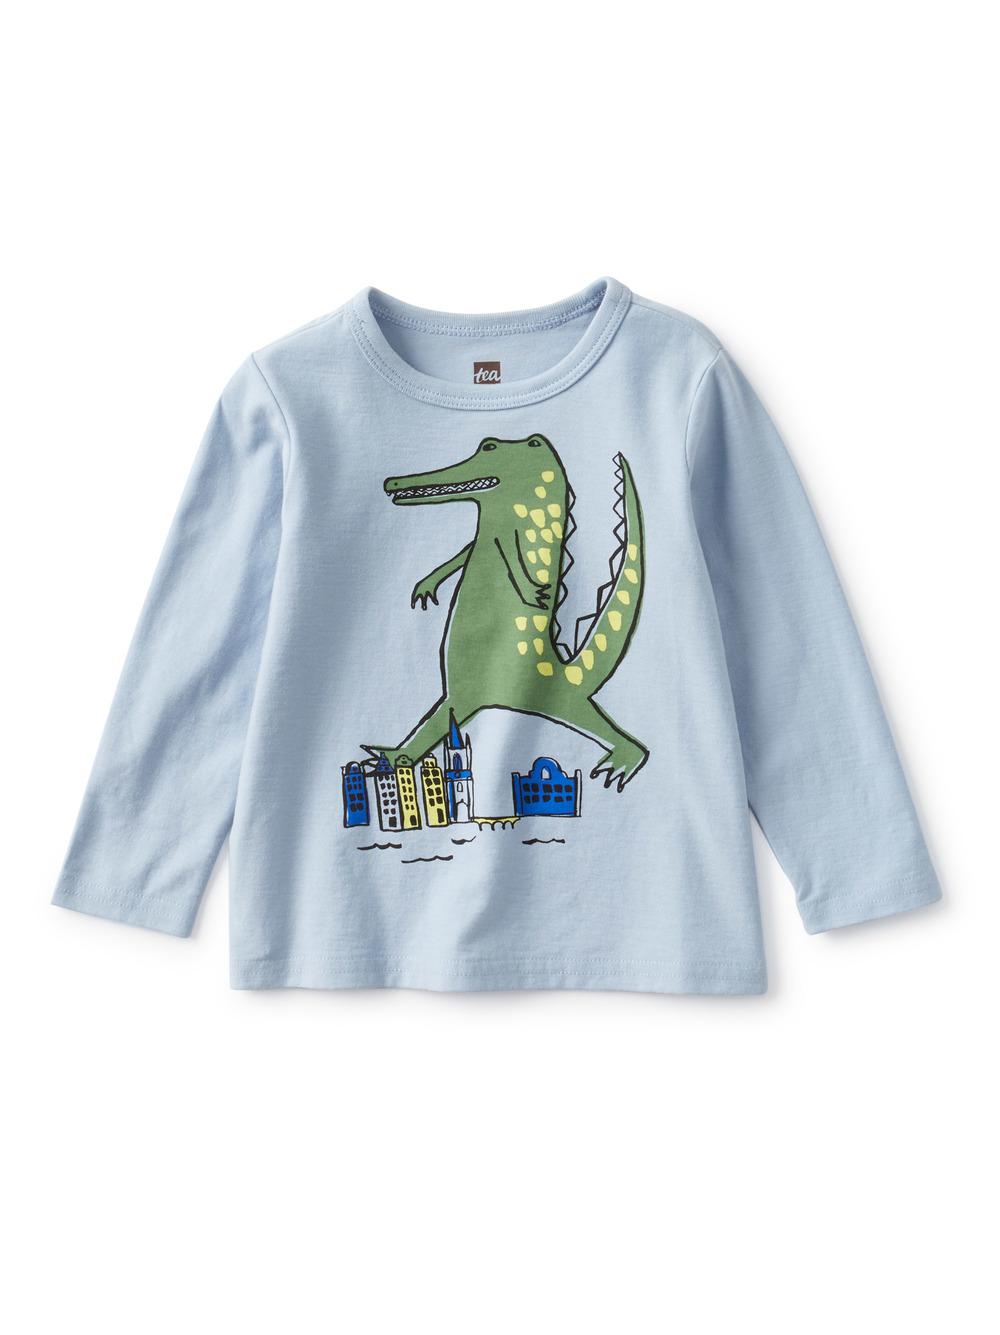 Stompin' Croc Baby Graphic Tee